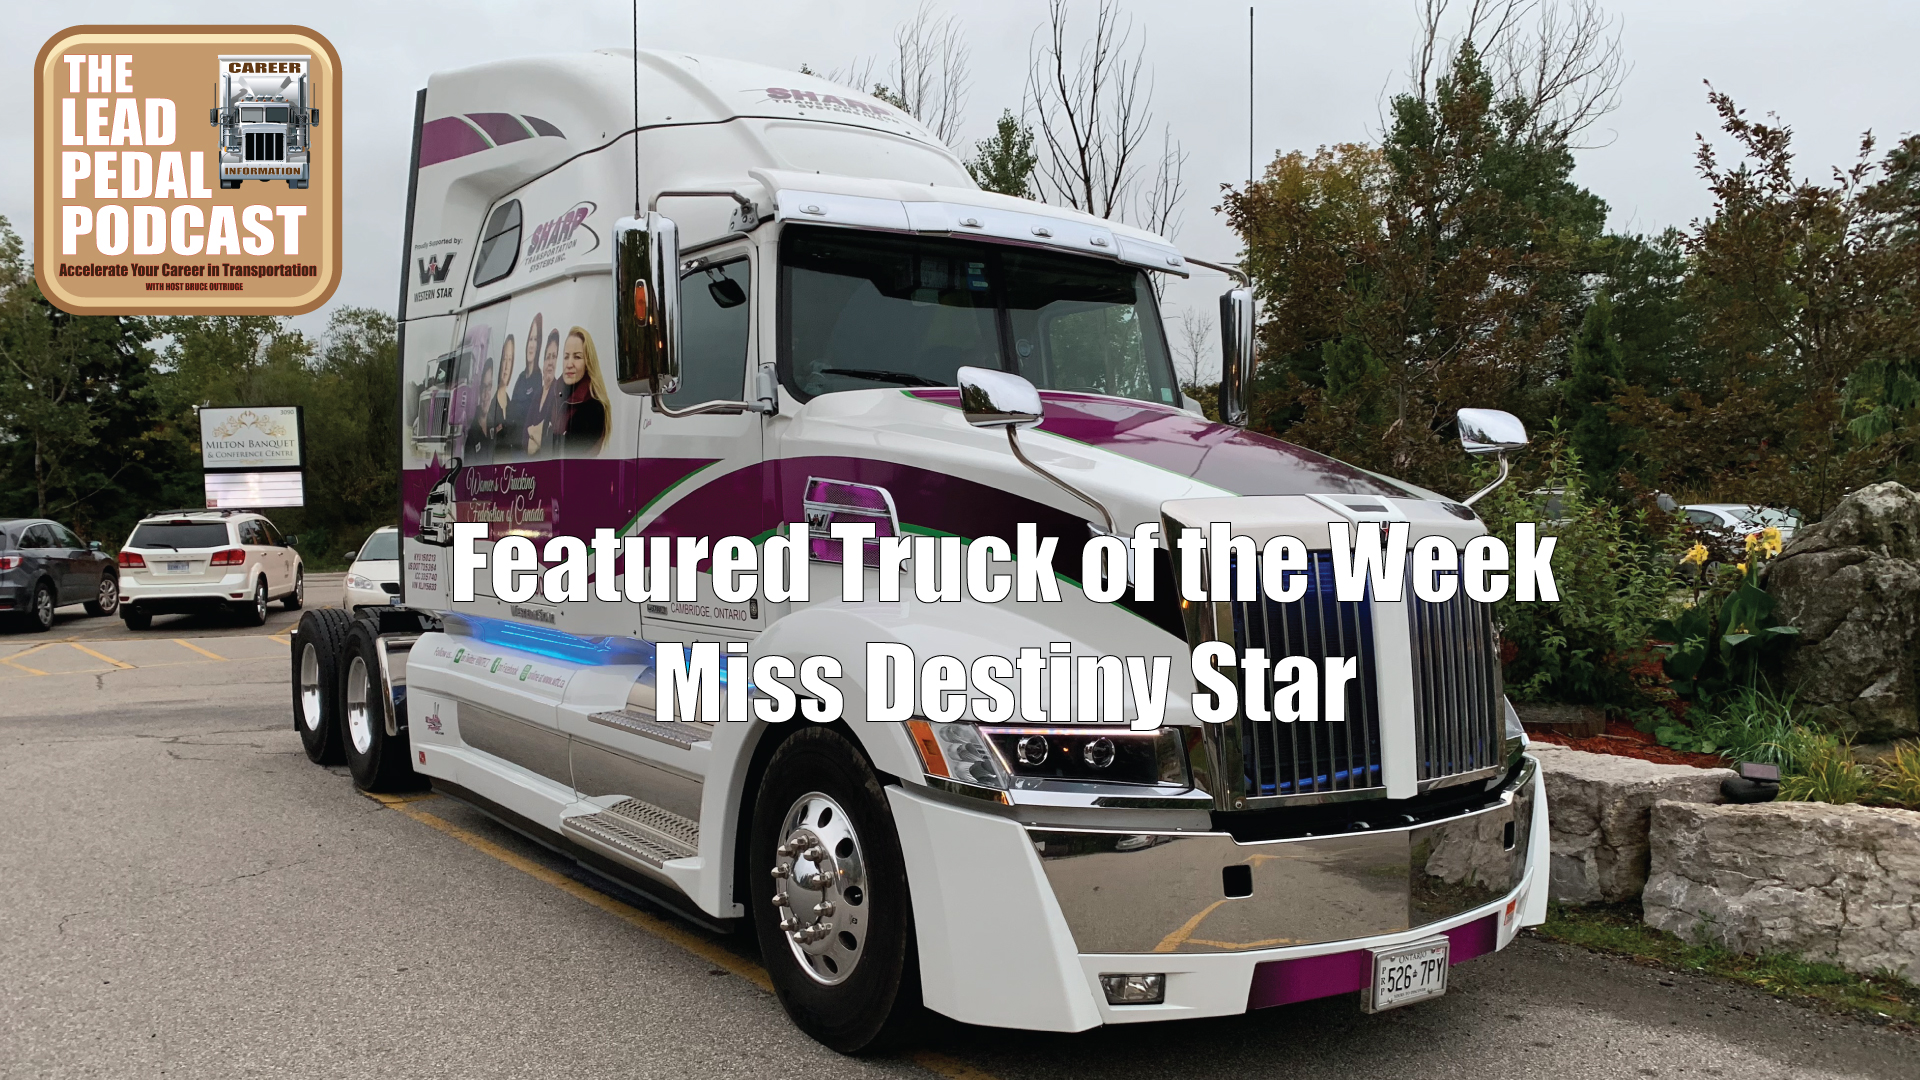 Destiny Star